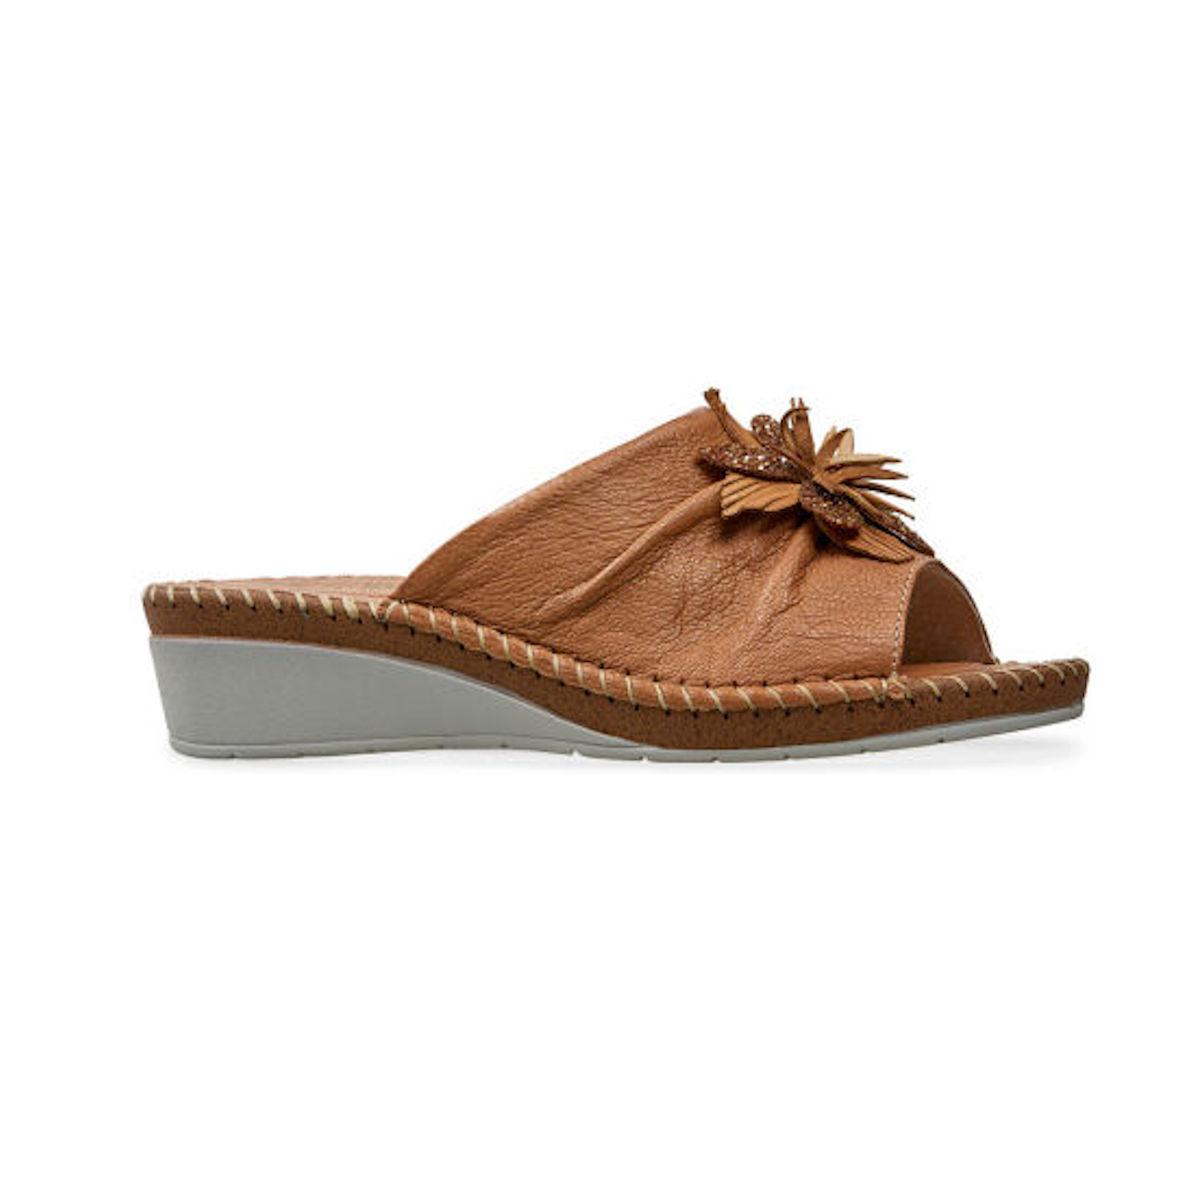 Womems Van Dal Banks Camel Leather Sandal